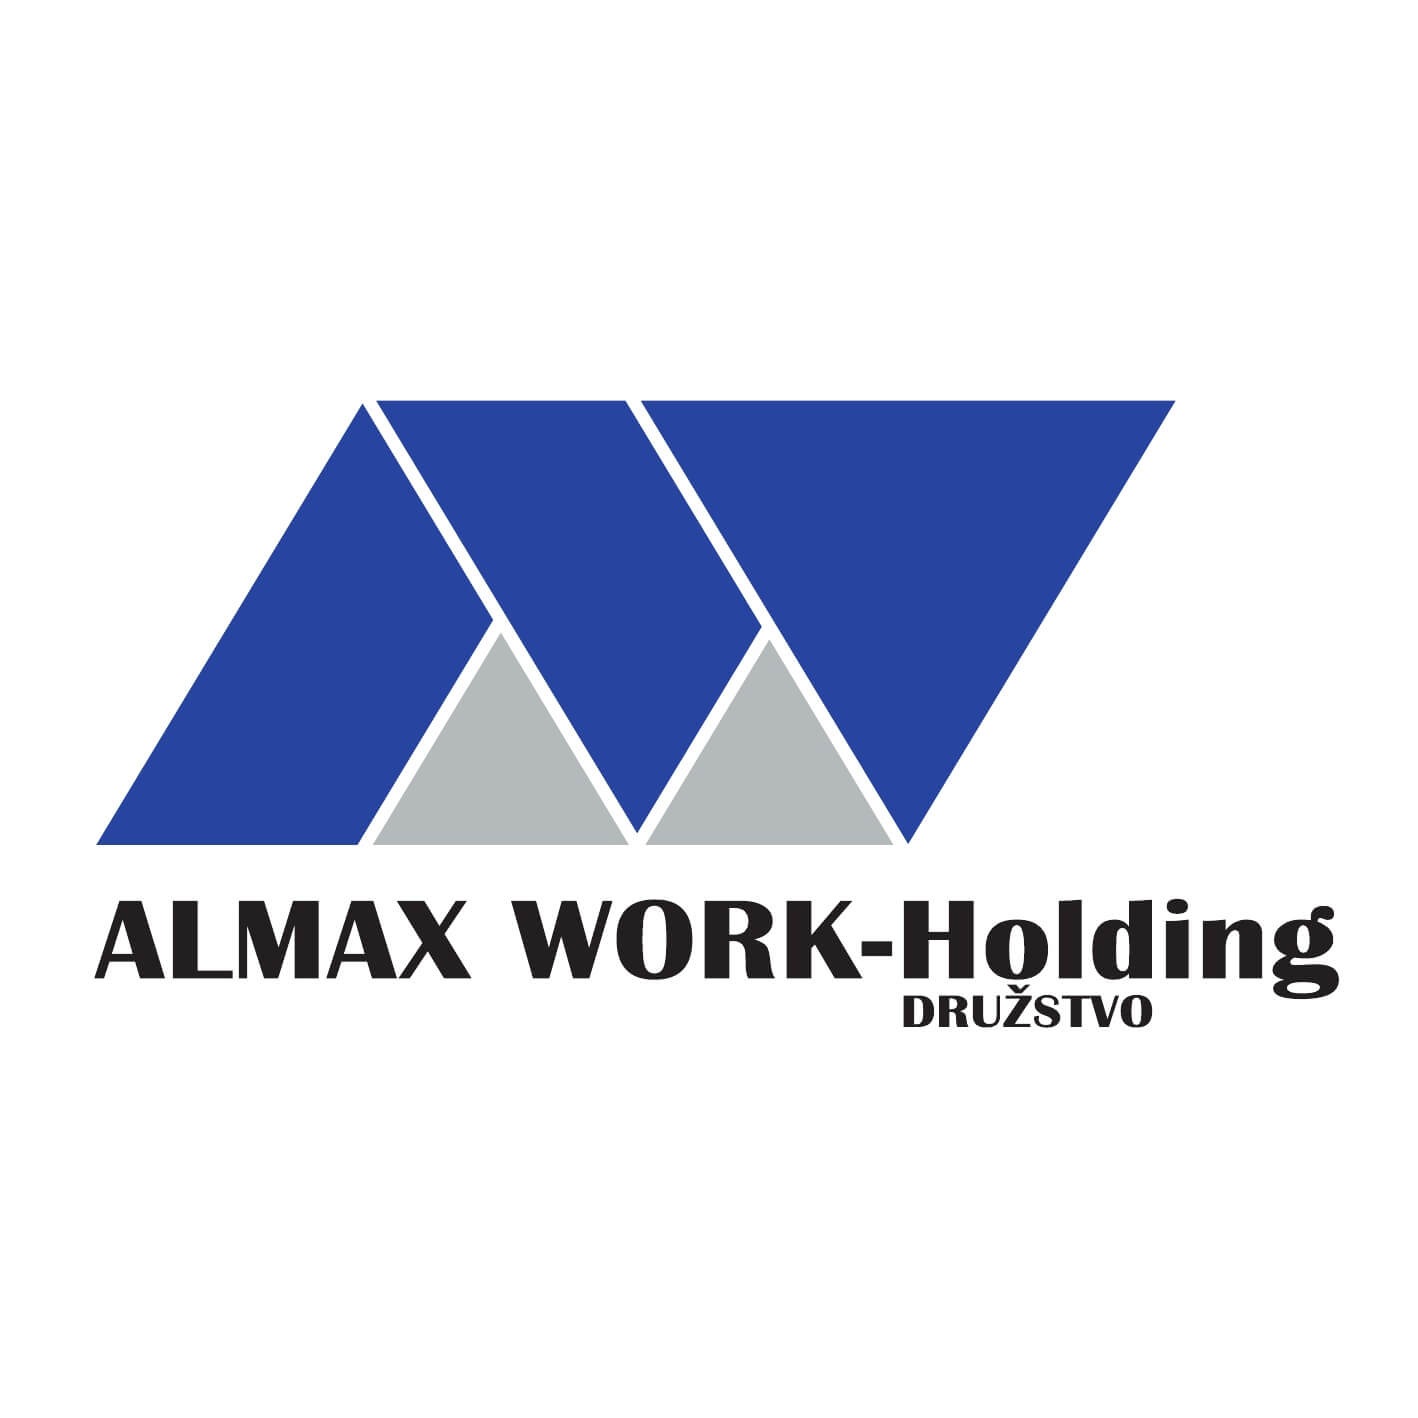 ALMAX WORK-Holding, družstvo